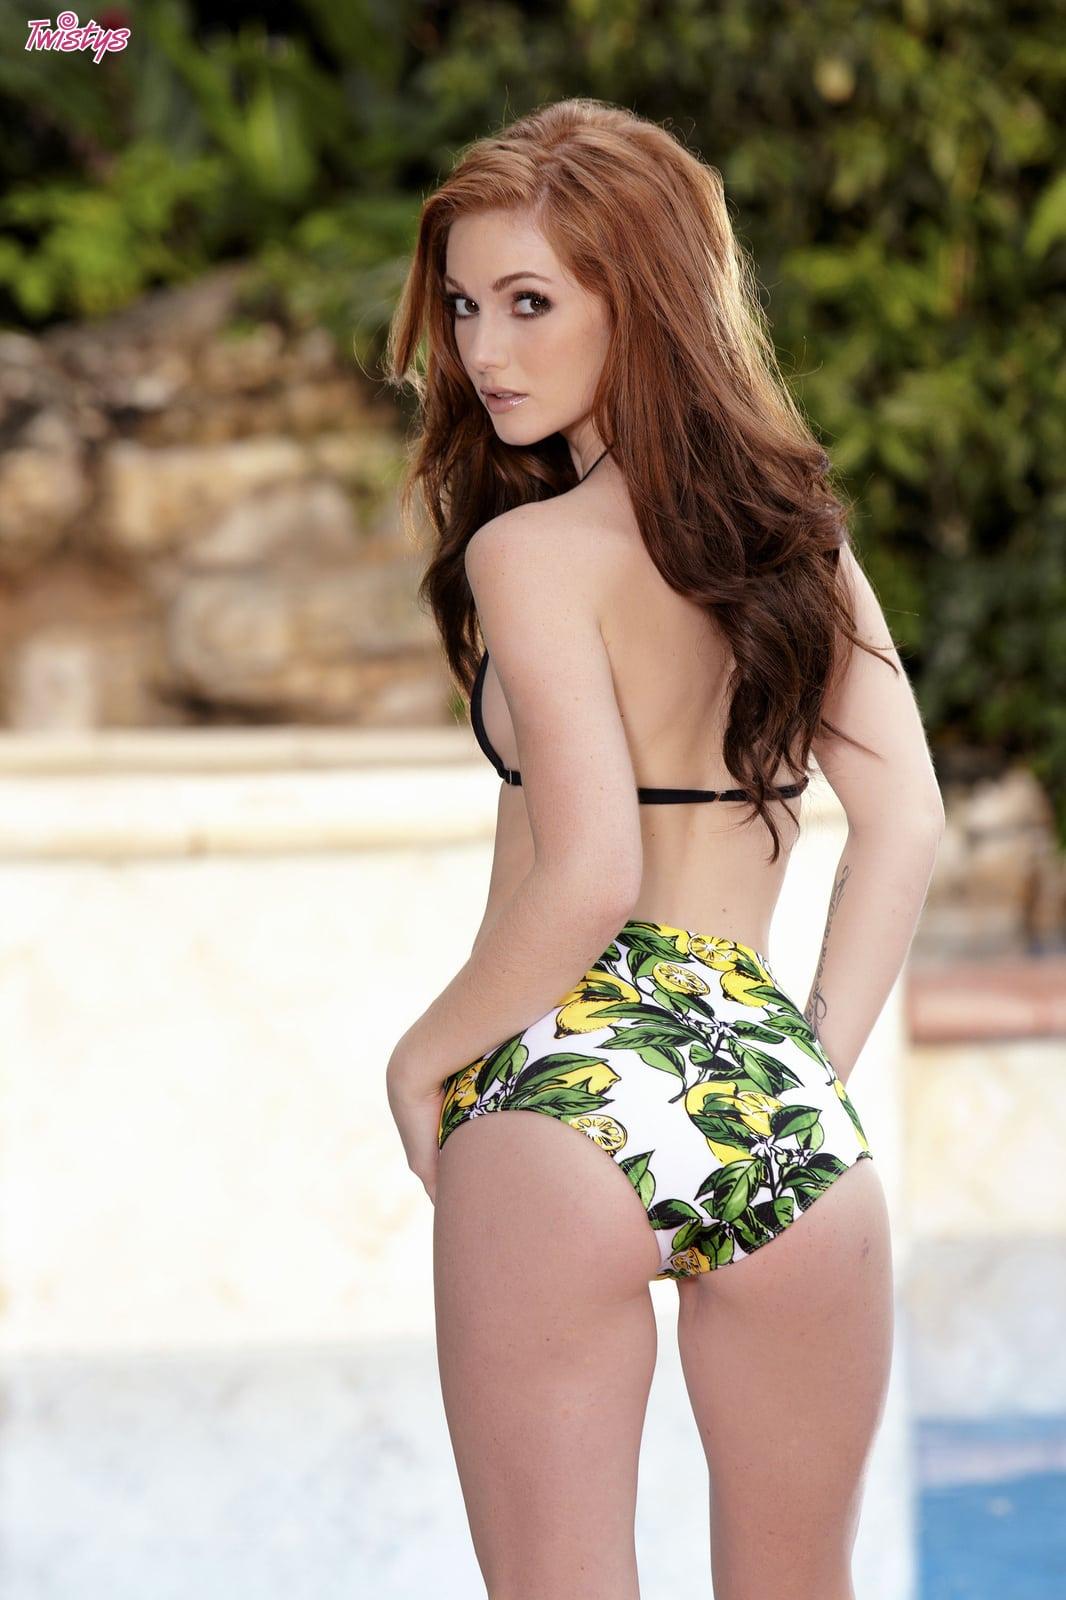 Amber takes her bikini off for you 9